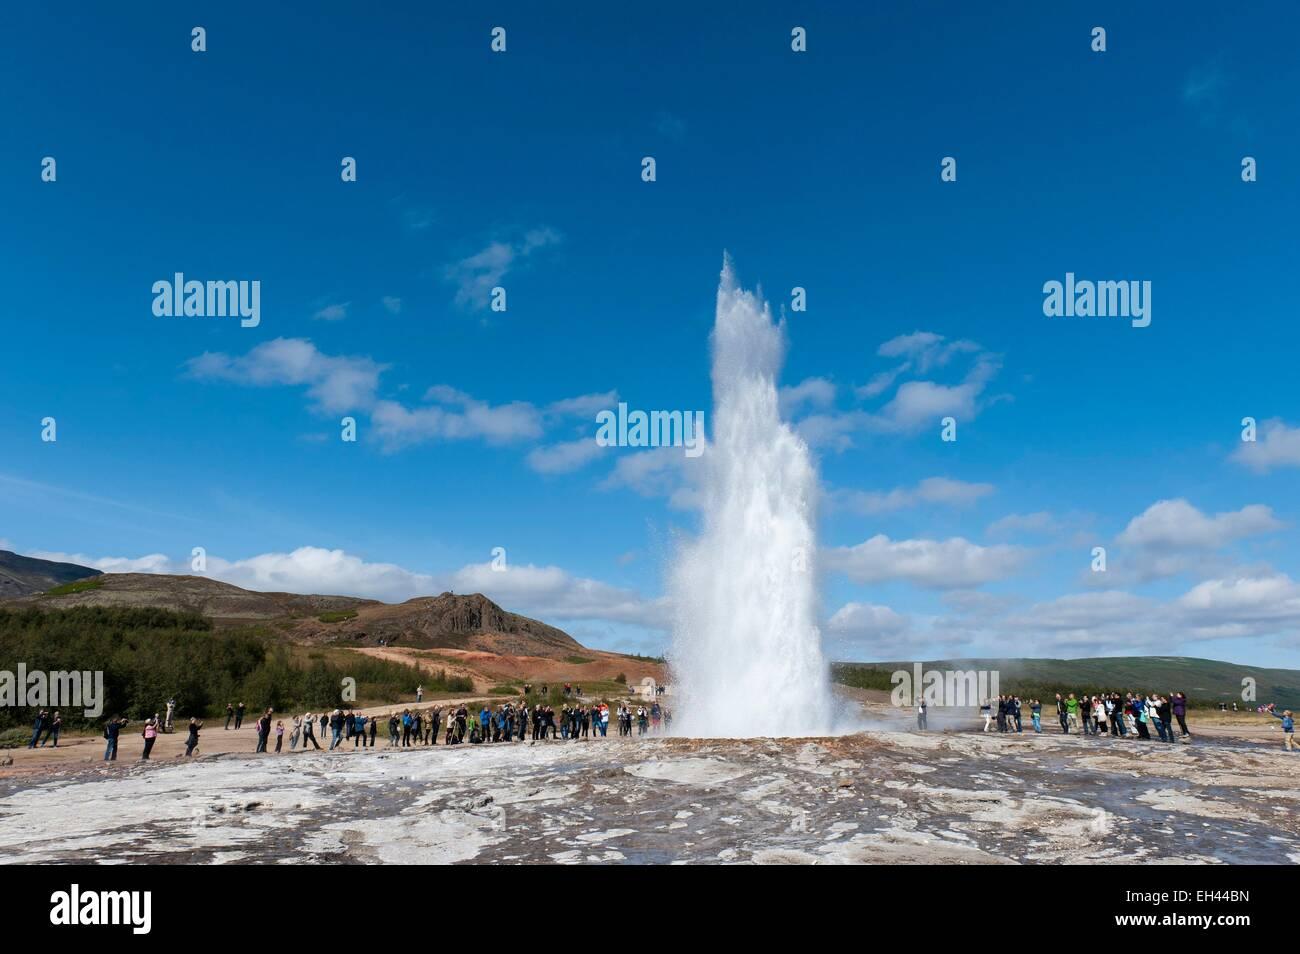 Iceland, Sudurland region, valley of Haukadalur, site of Geysir, the geyser Strokkur Stock Photo